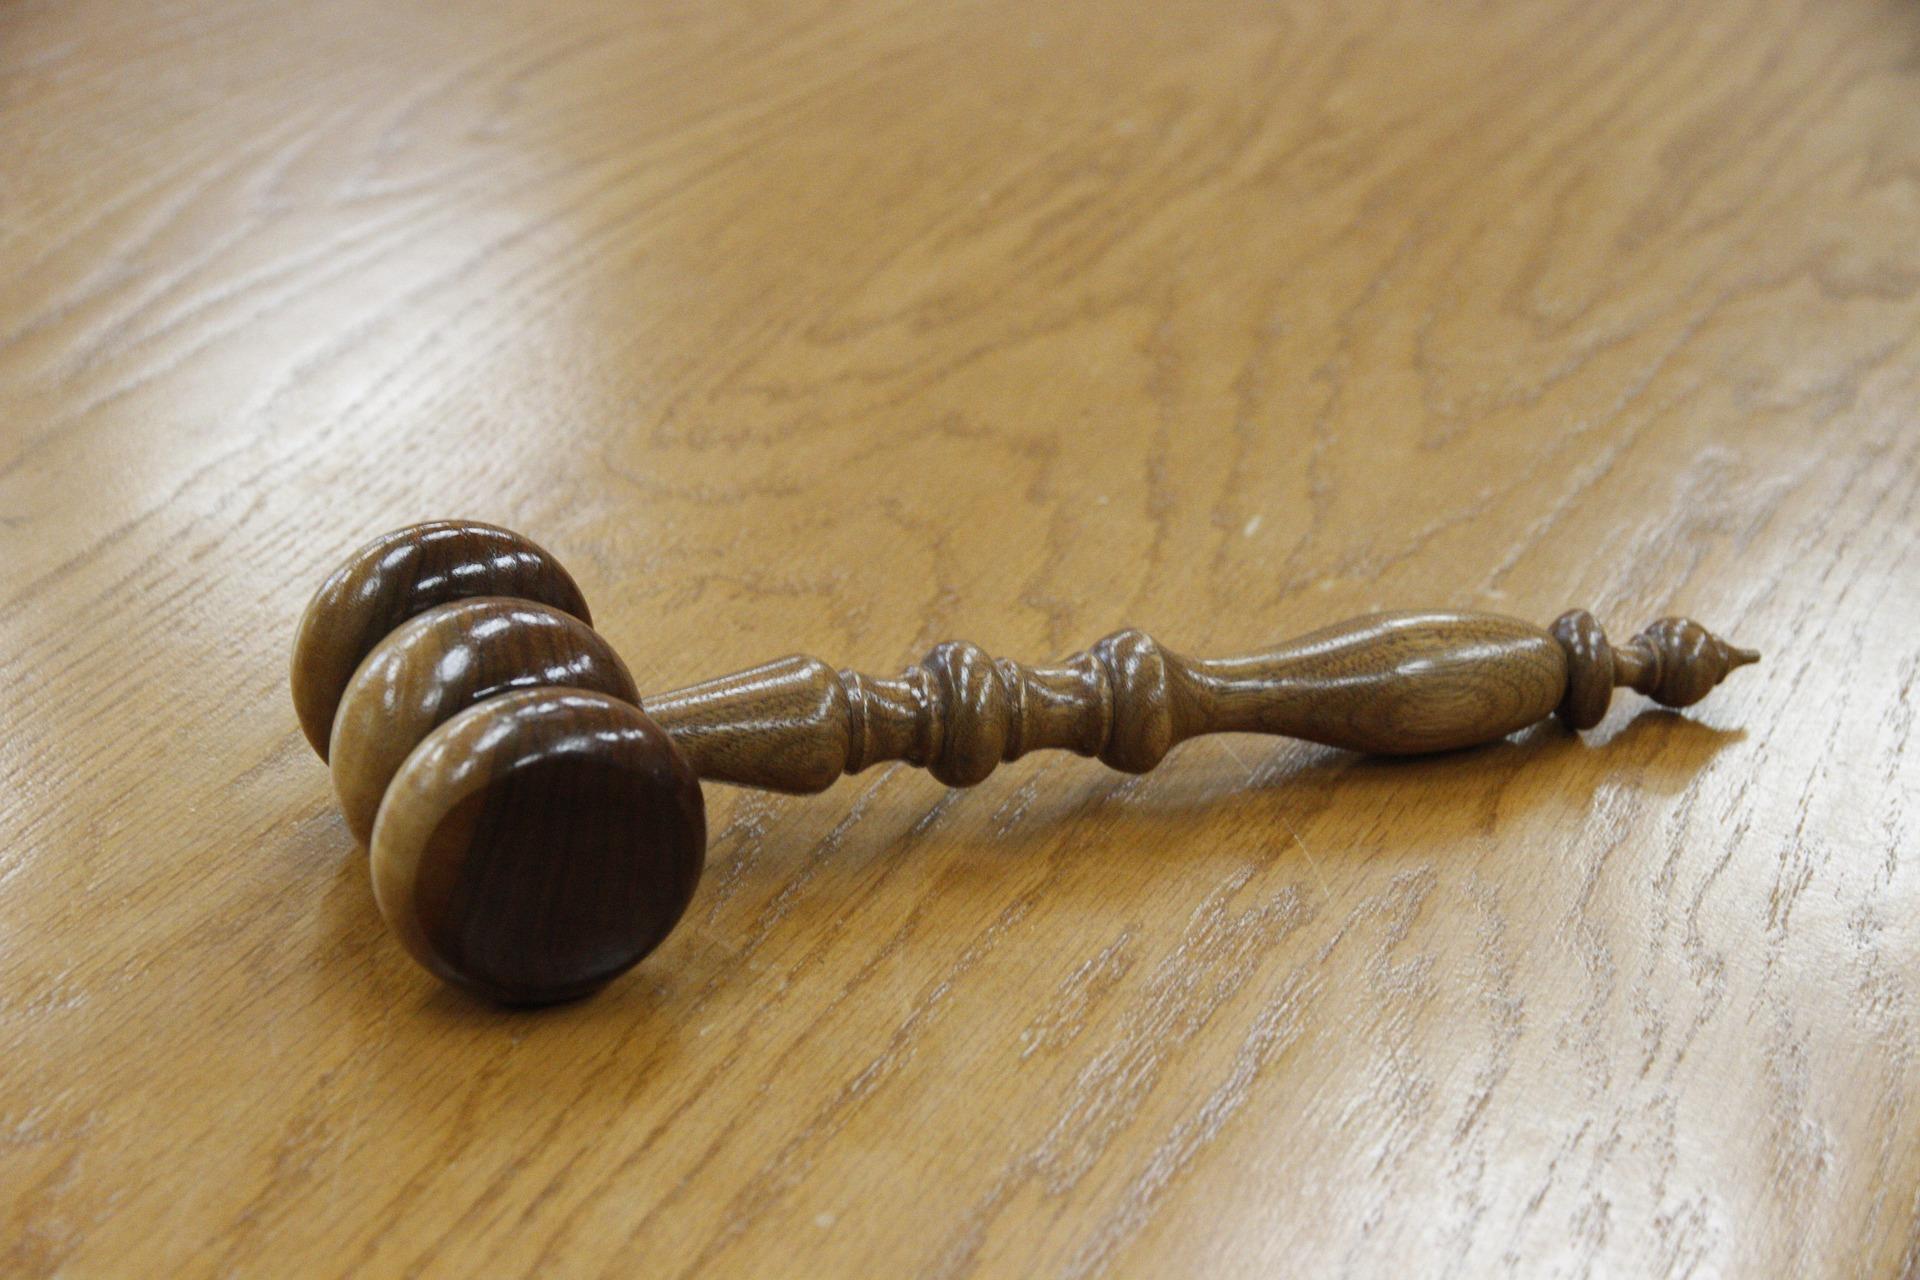 responsabilidades-del-perito-judicial-especialista-en-PRL Las diferentes responsabilidades del perito judicial especialista en PRL